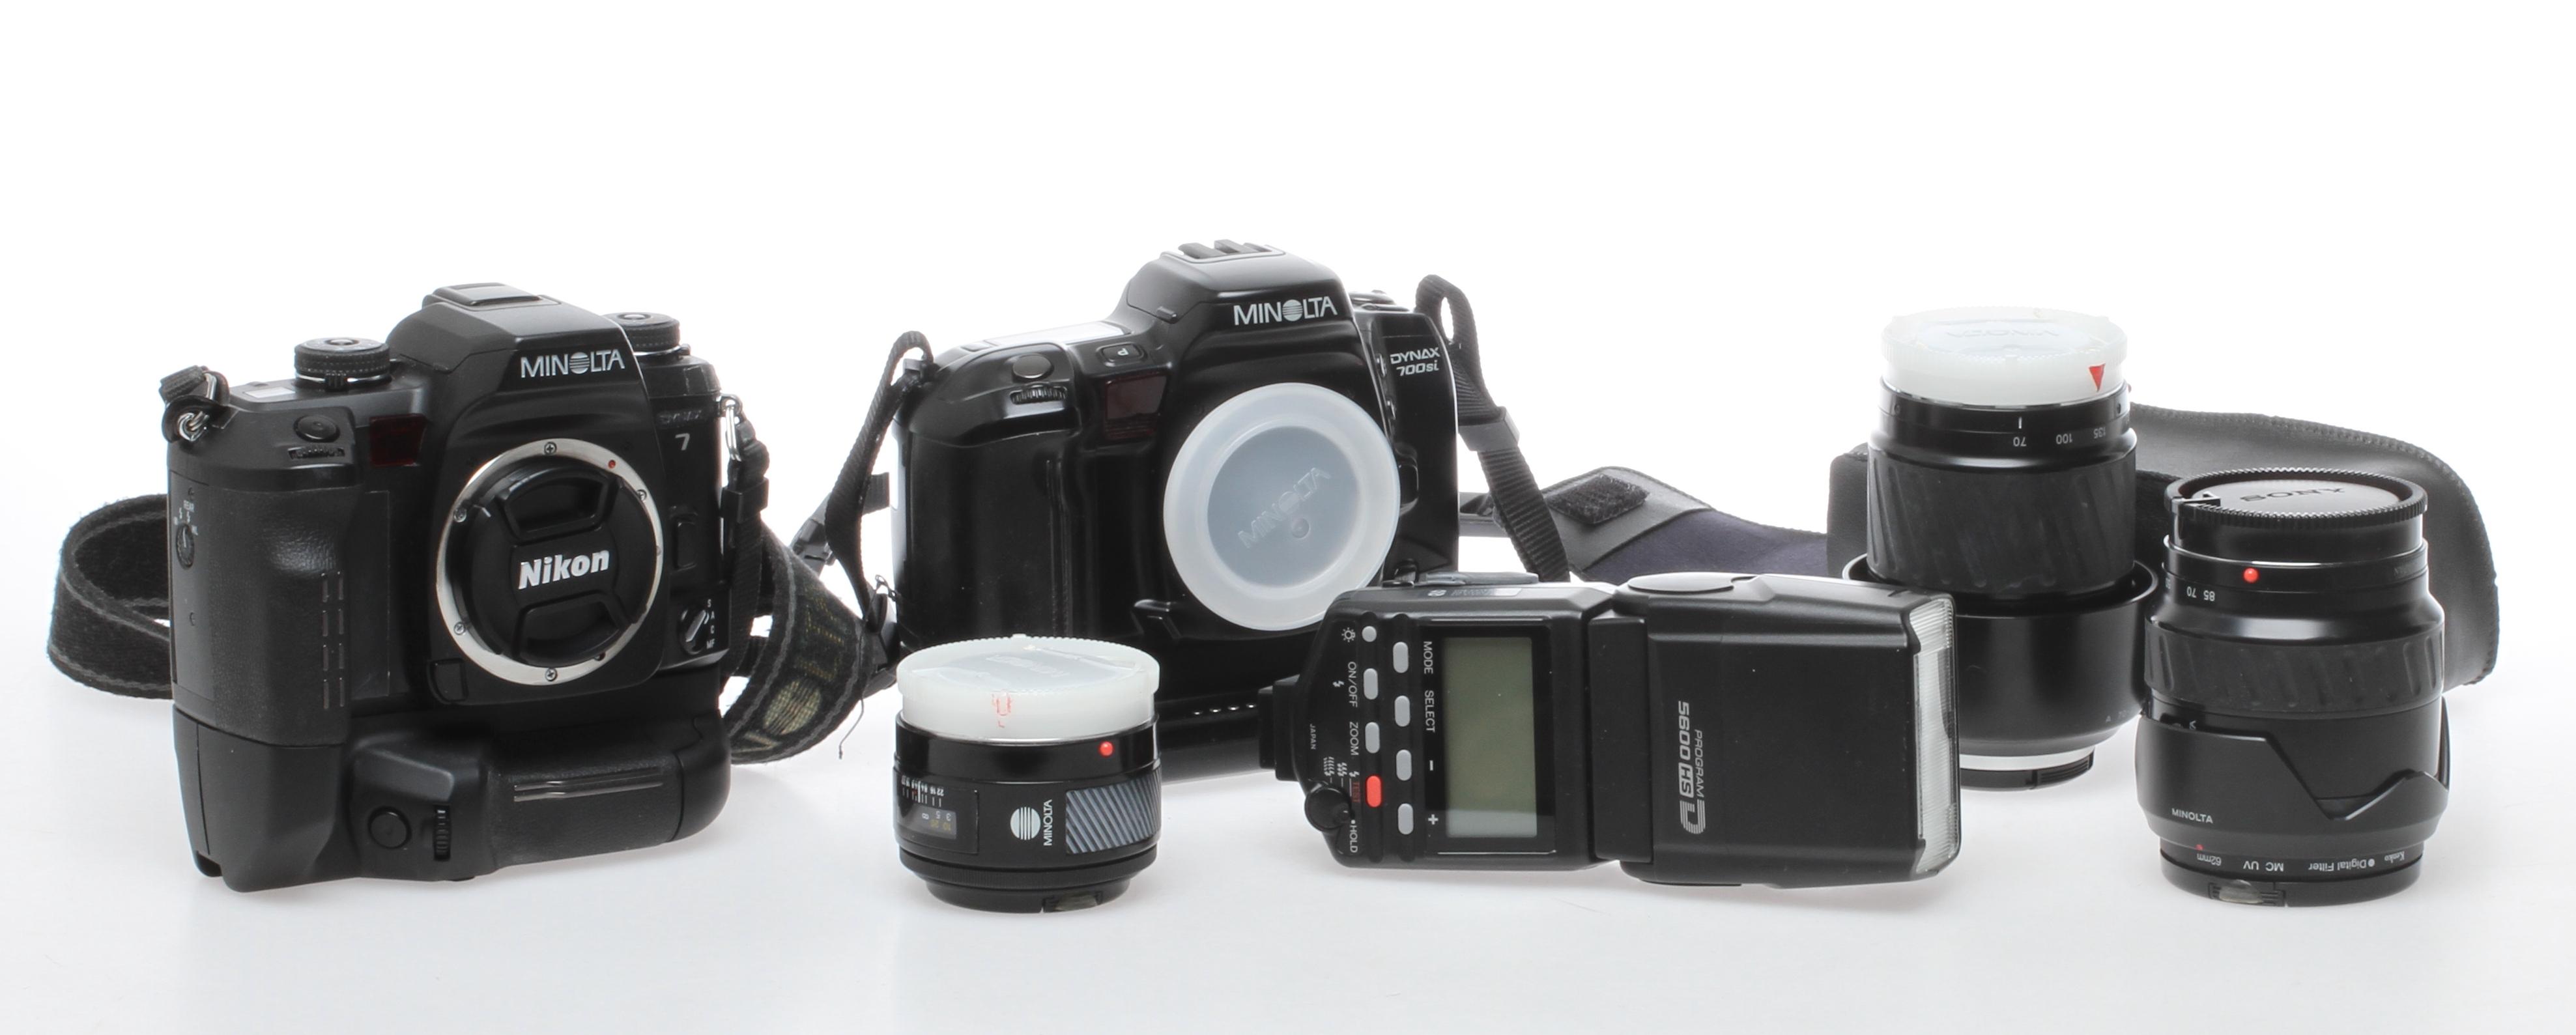 KAMEROR 2 St Dynax 7 Och 700si Photo Cameras Lenses